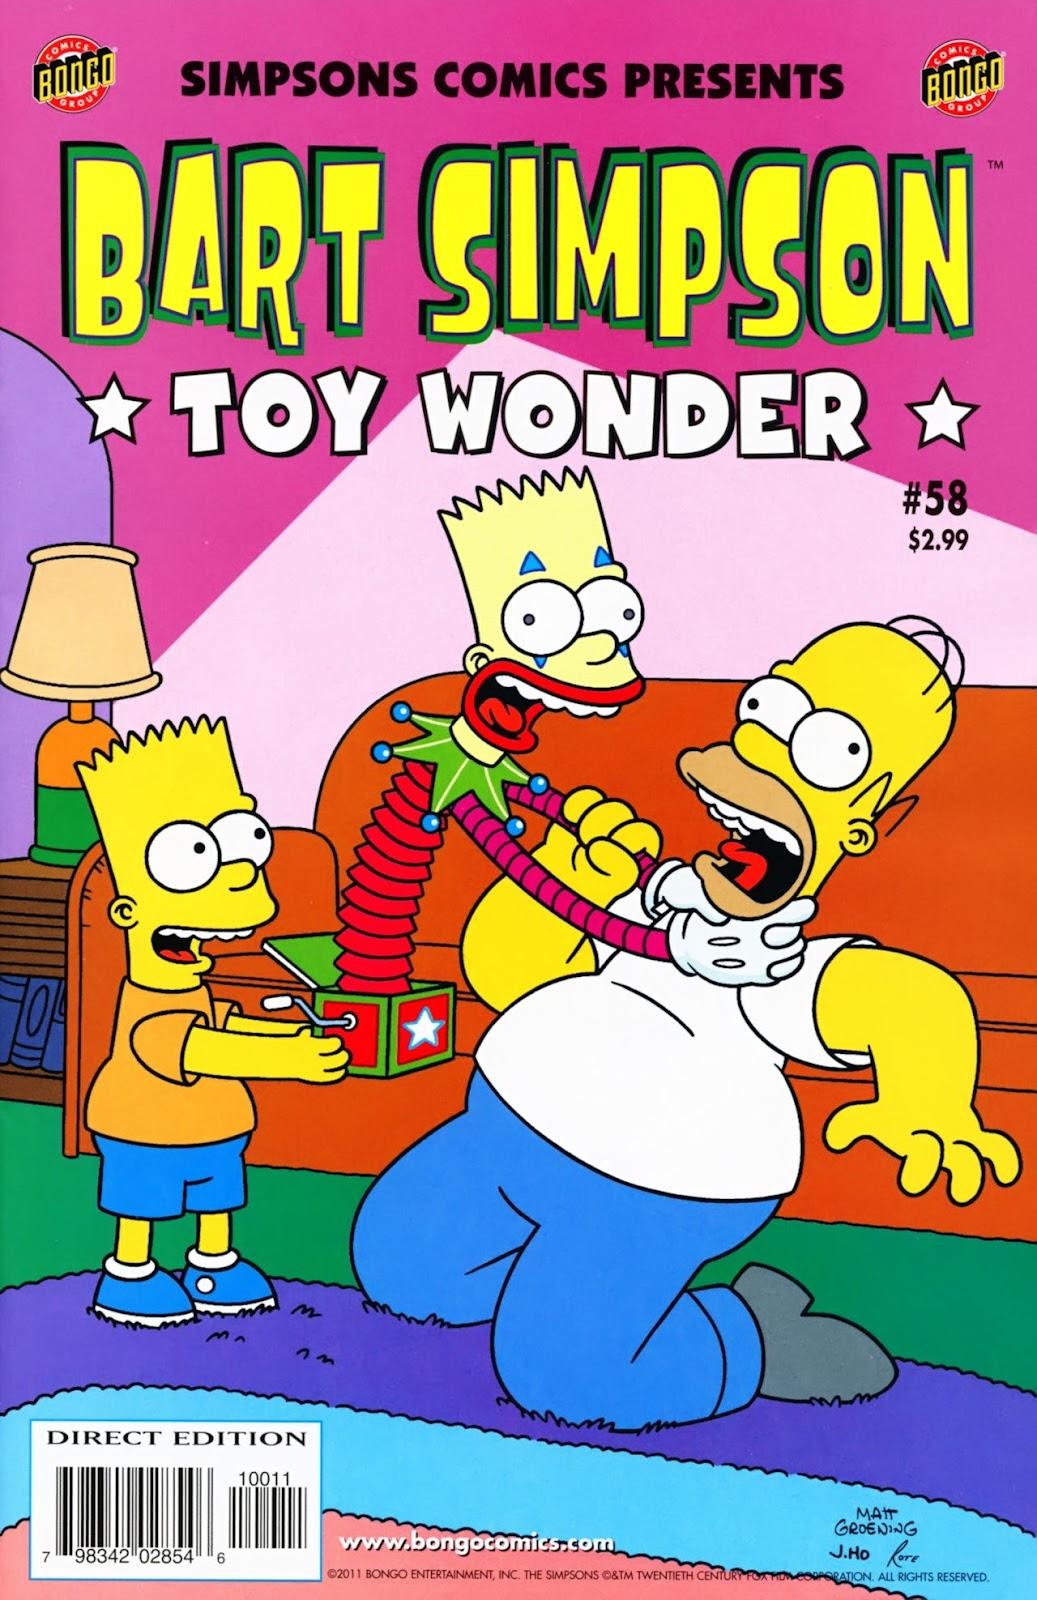 Simpsons Comics Presents Bart Simpson 58 Page 1